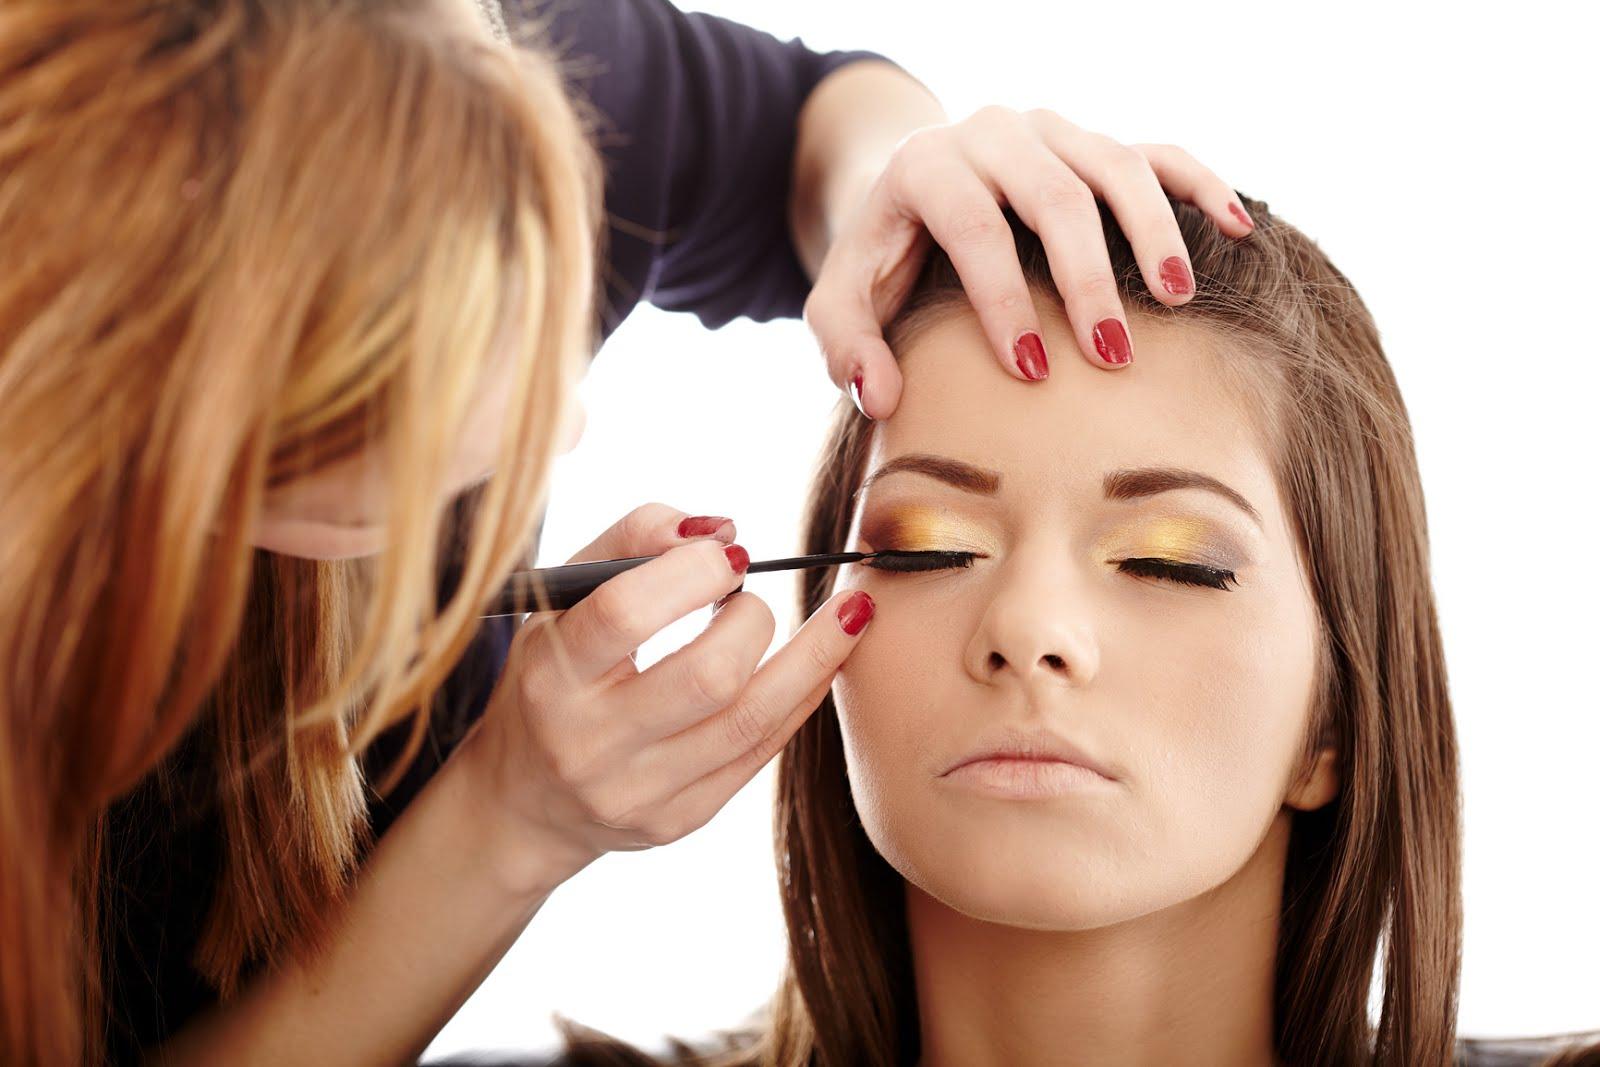 Makeup artist classes